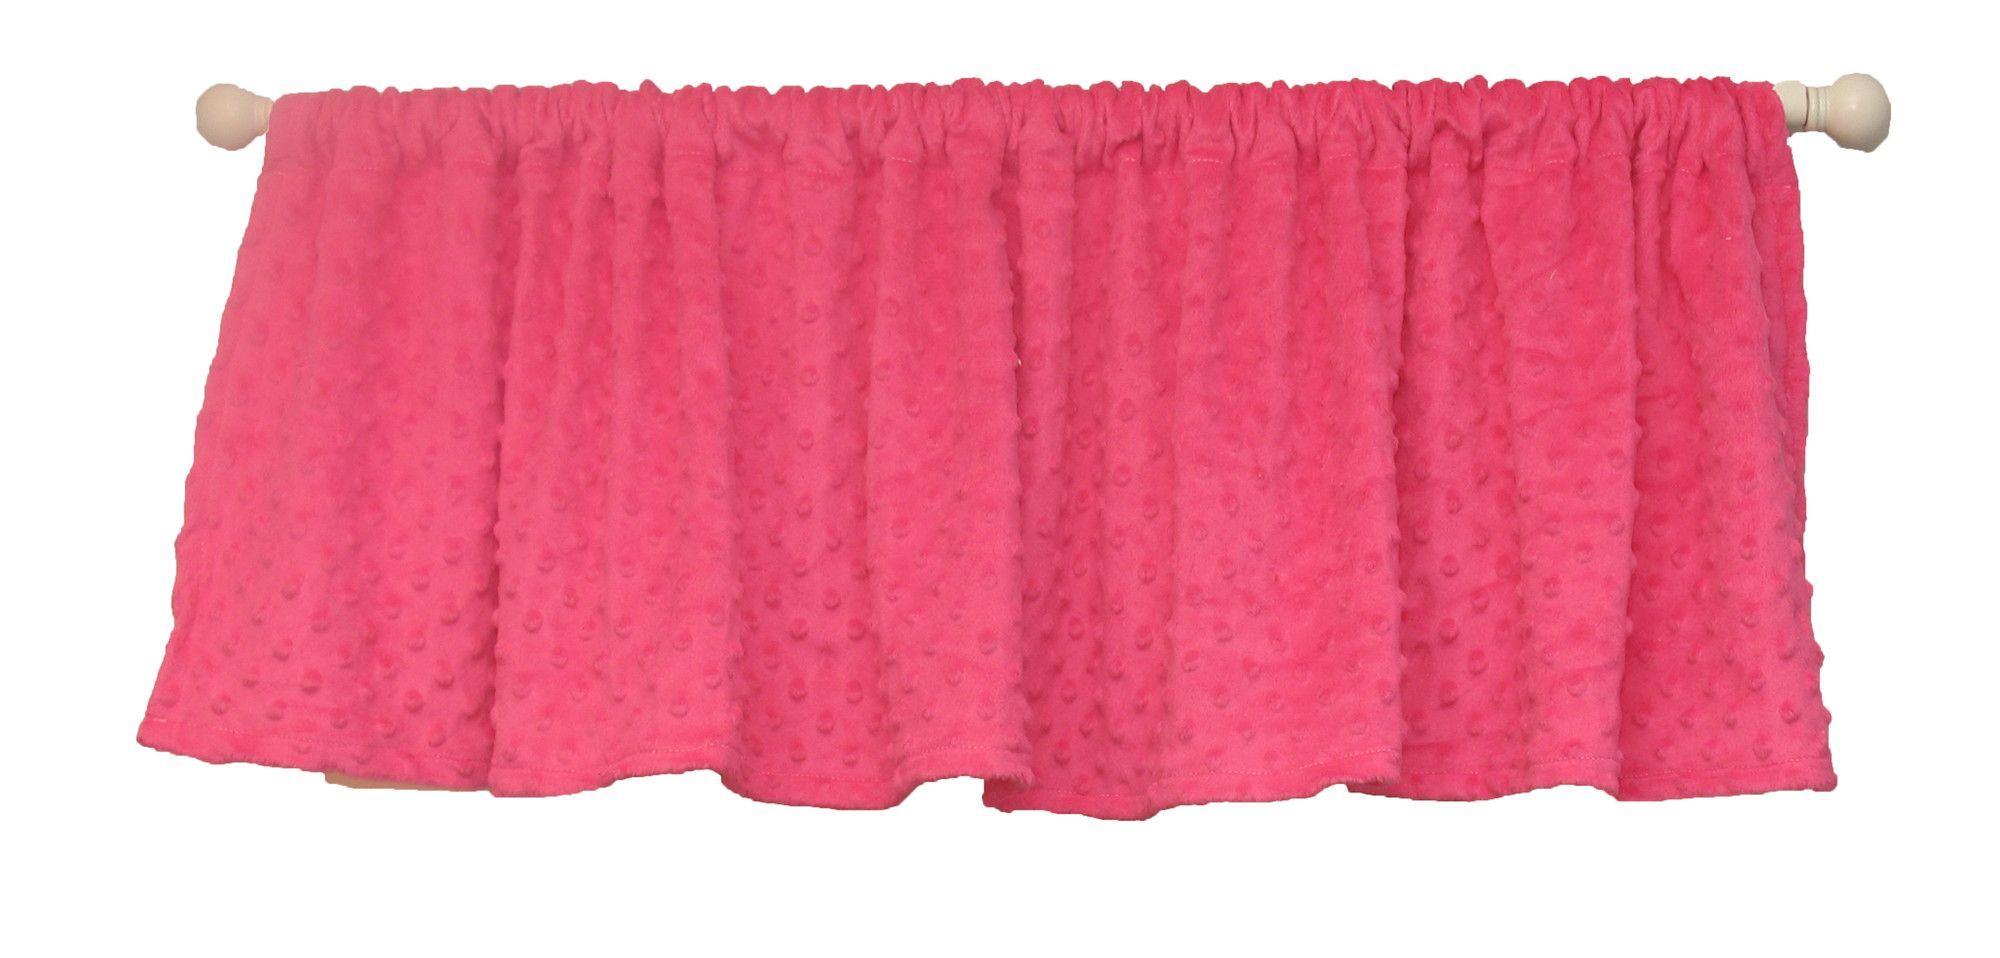 Hot pink zebra curtains - Hot Pink Zebra Curtain Valance